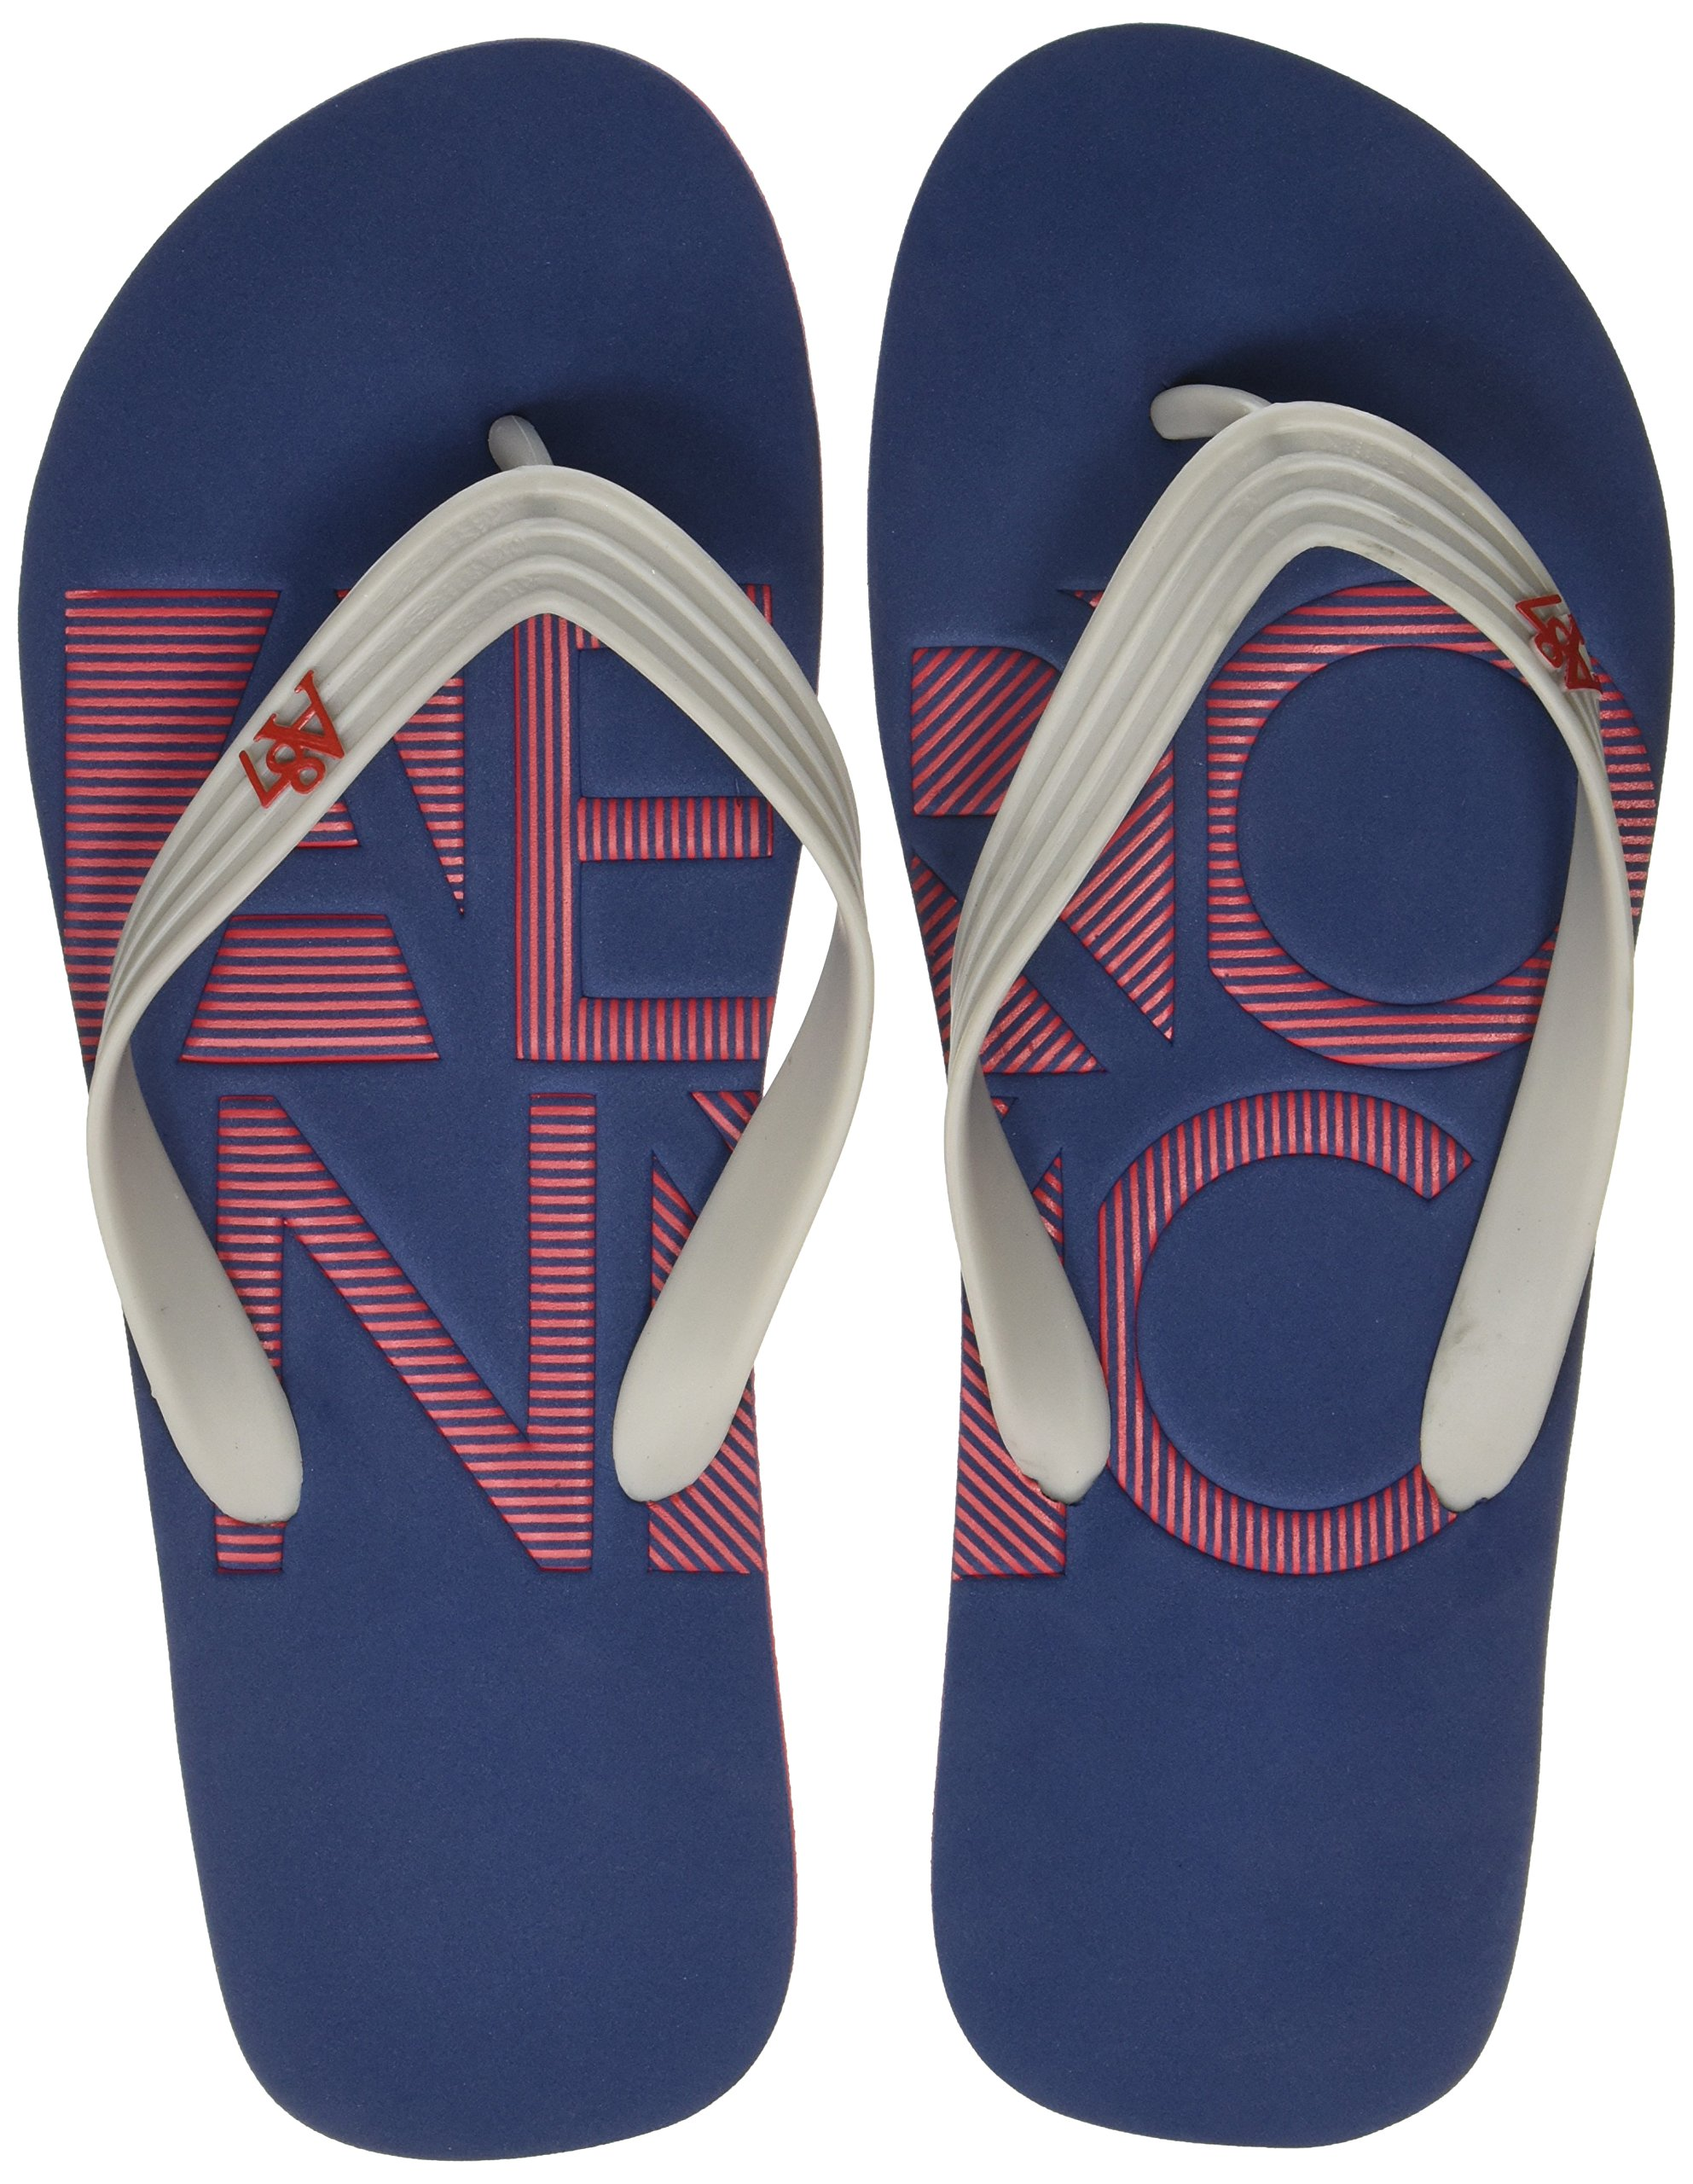 Columbus Flip Flops Thong Sandals